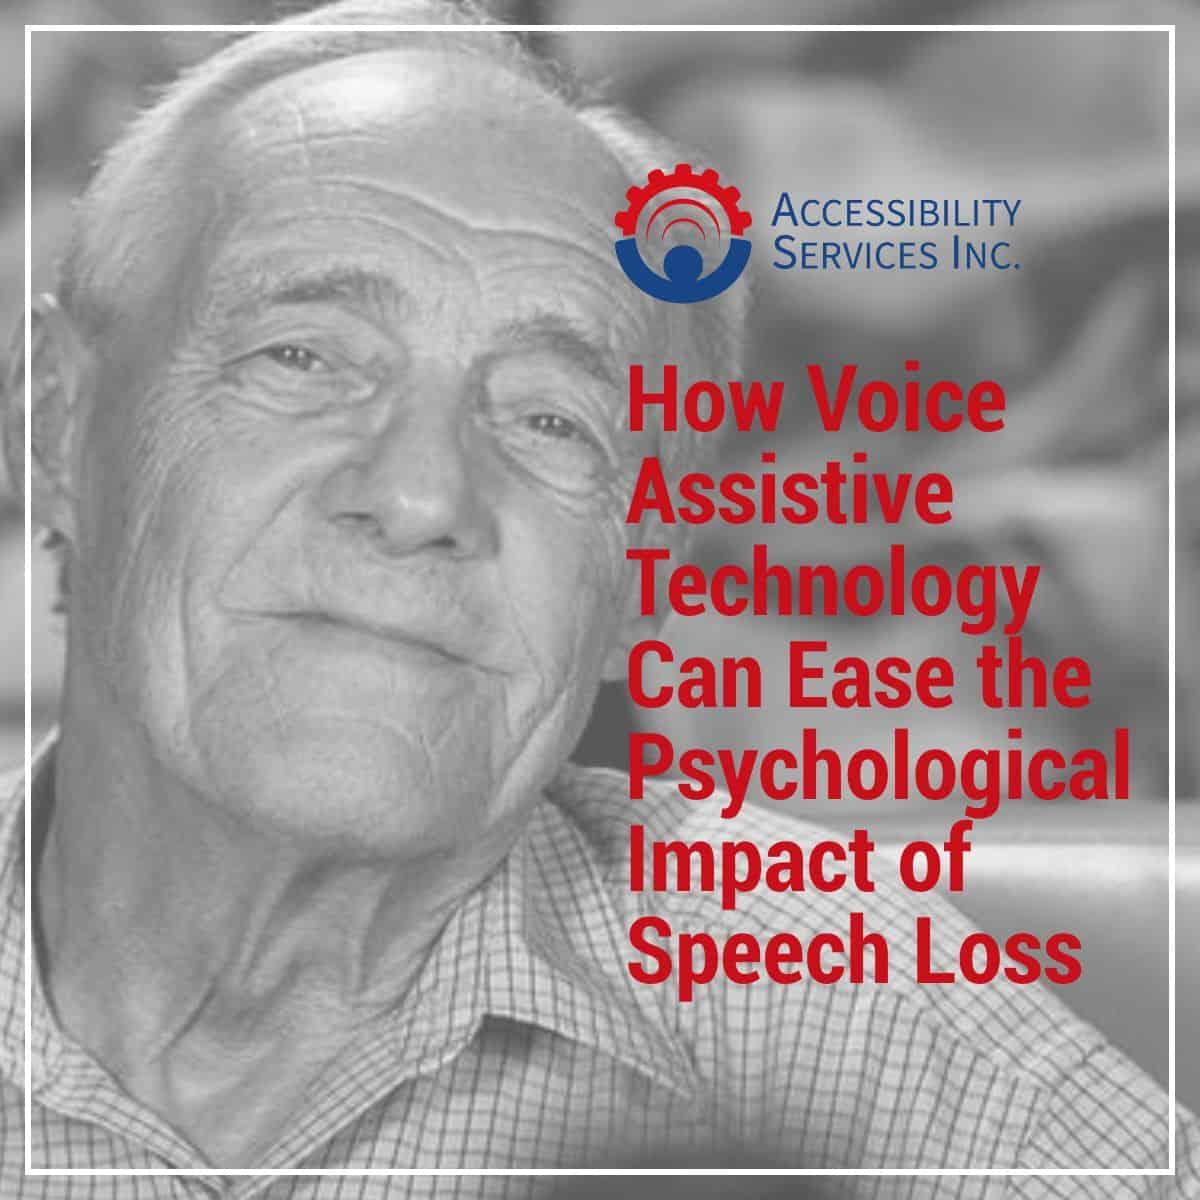 Voice Assistive Technology